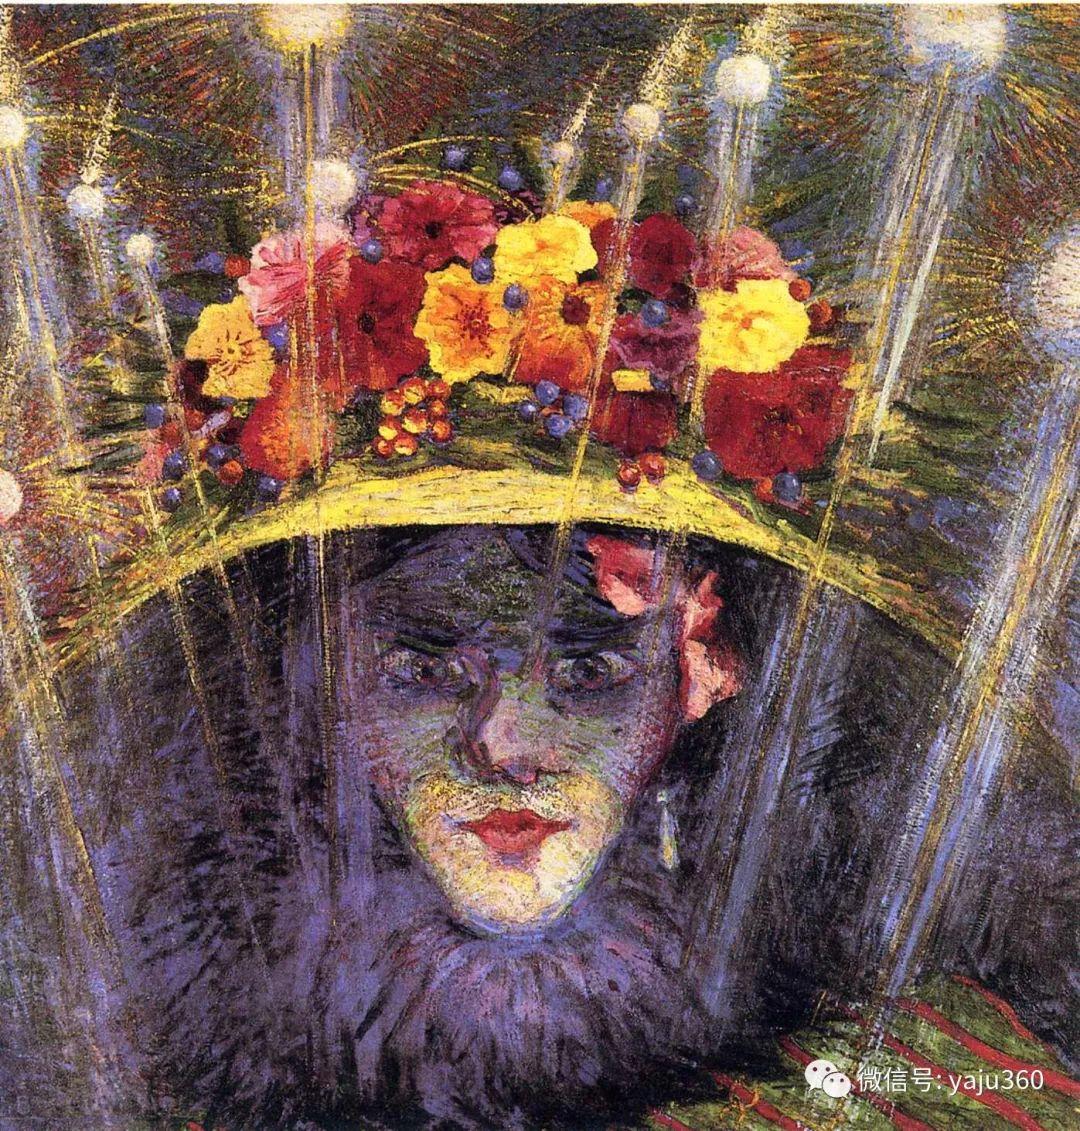 未来主义 意大利画家Umberto Boccioni插图39